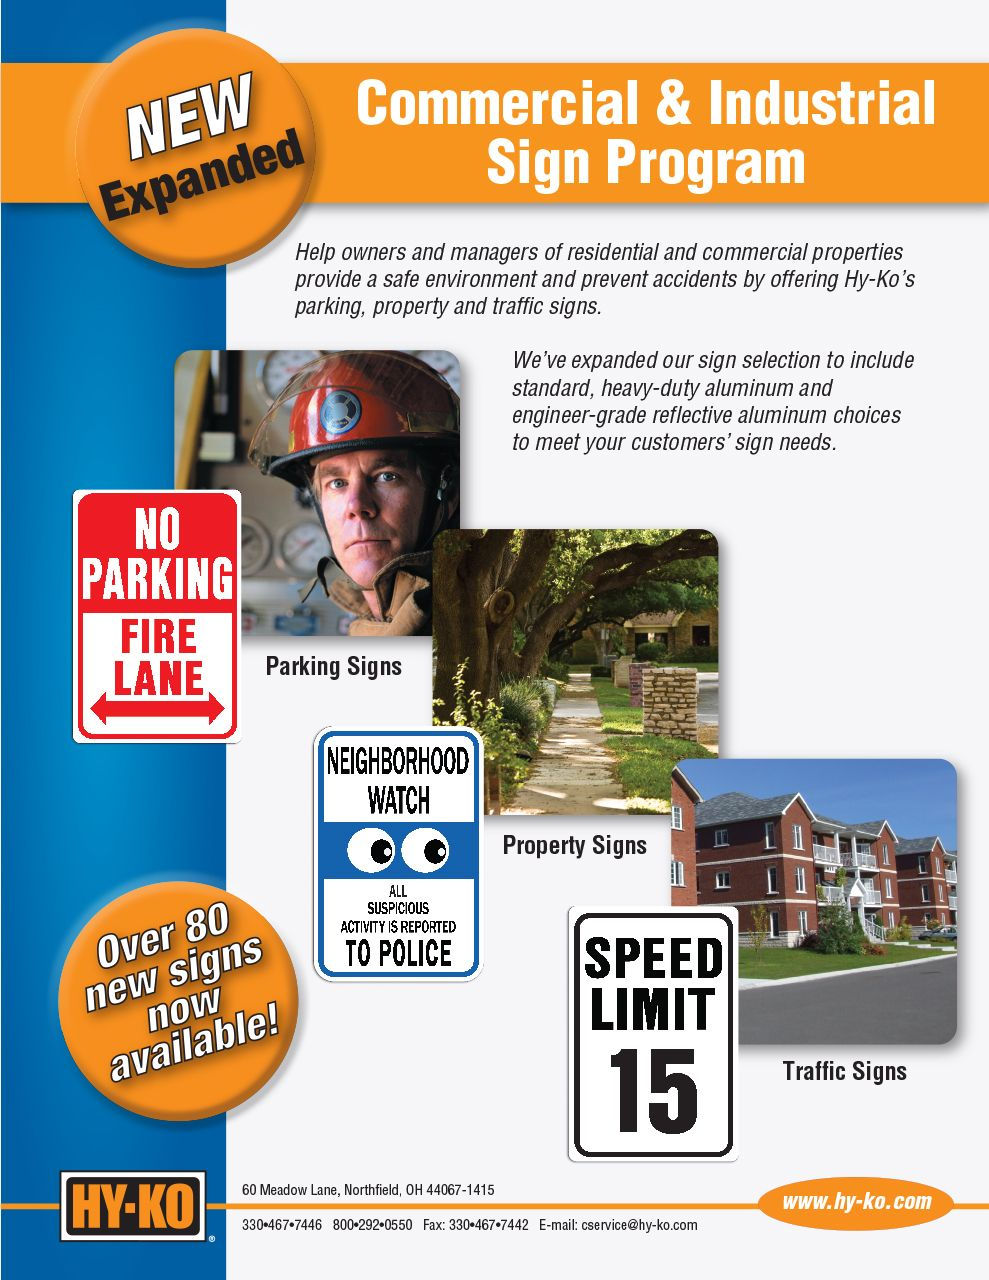 Commercial & Industrial Sign Program